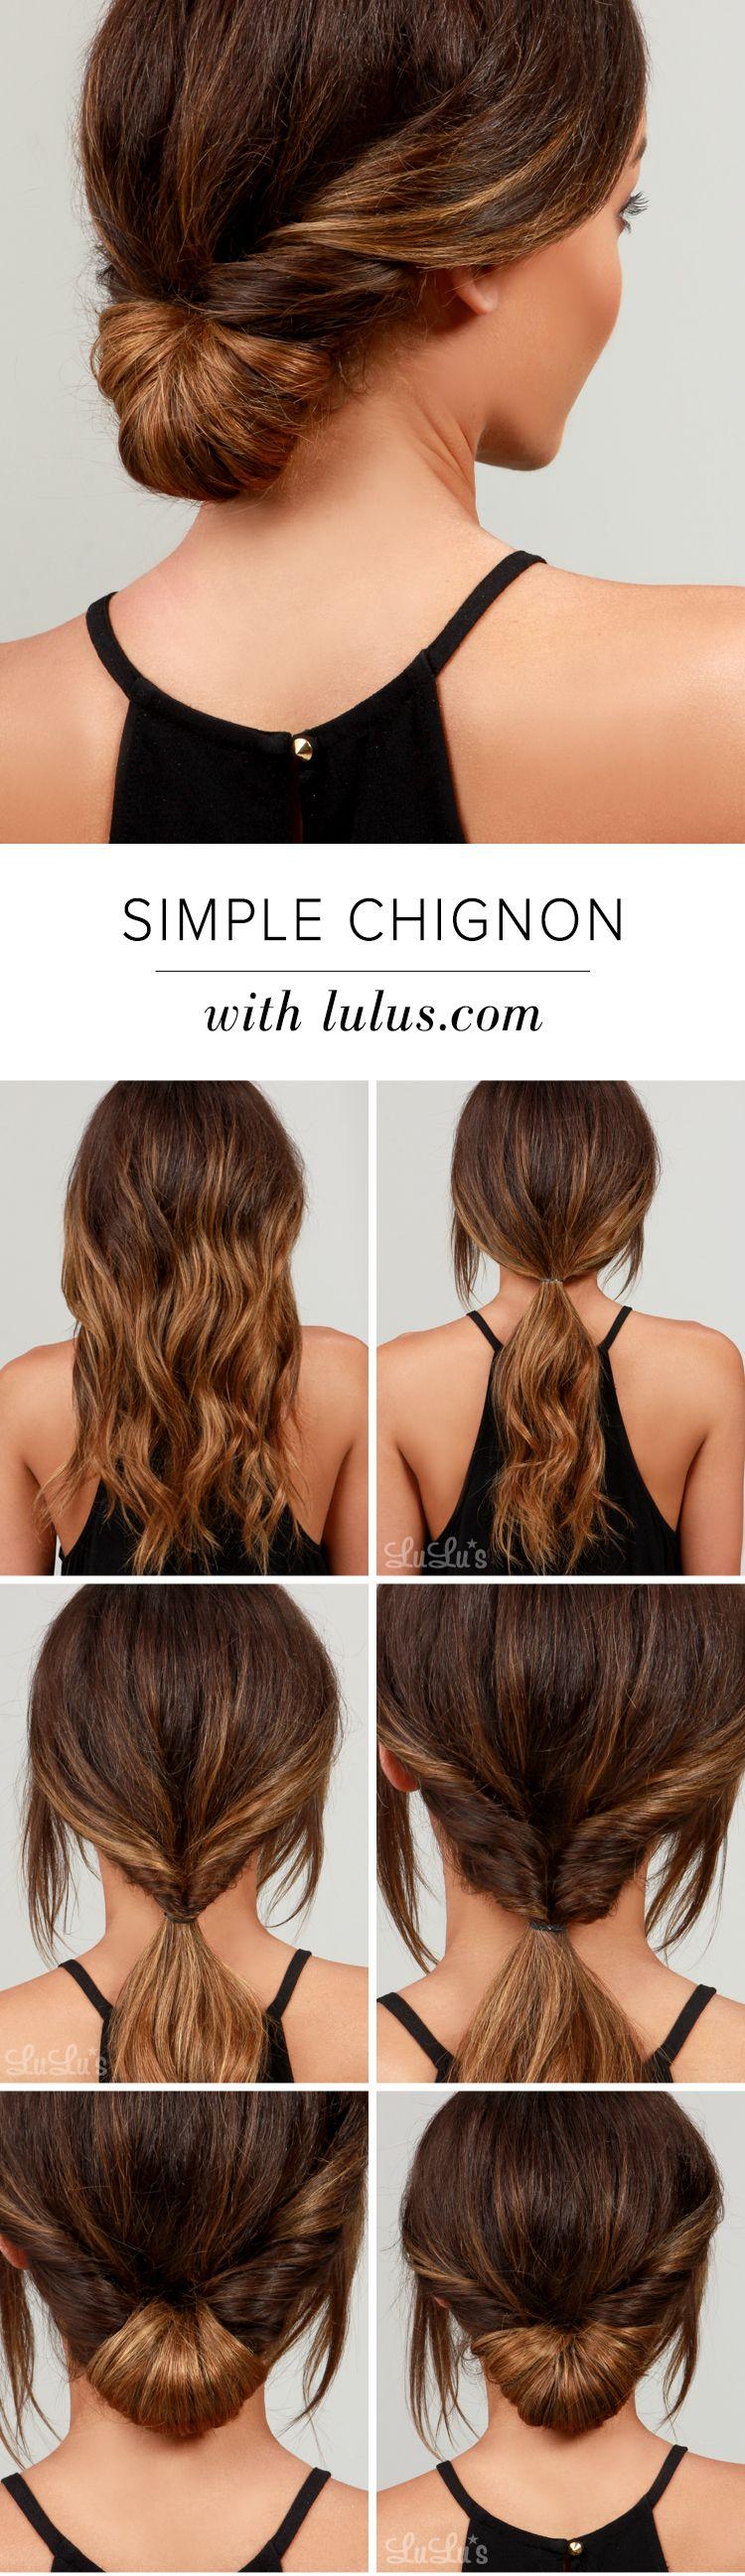 Lulus How To Simple Chignon Hair Tutorial Pinterest